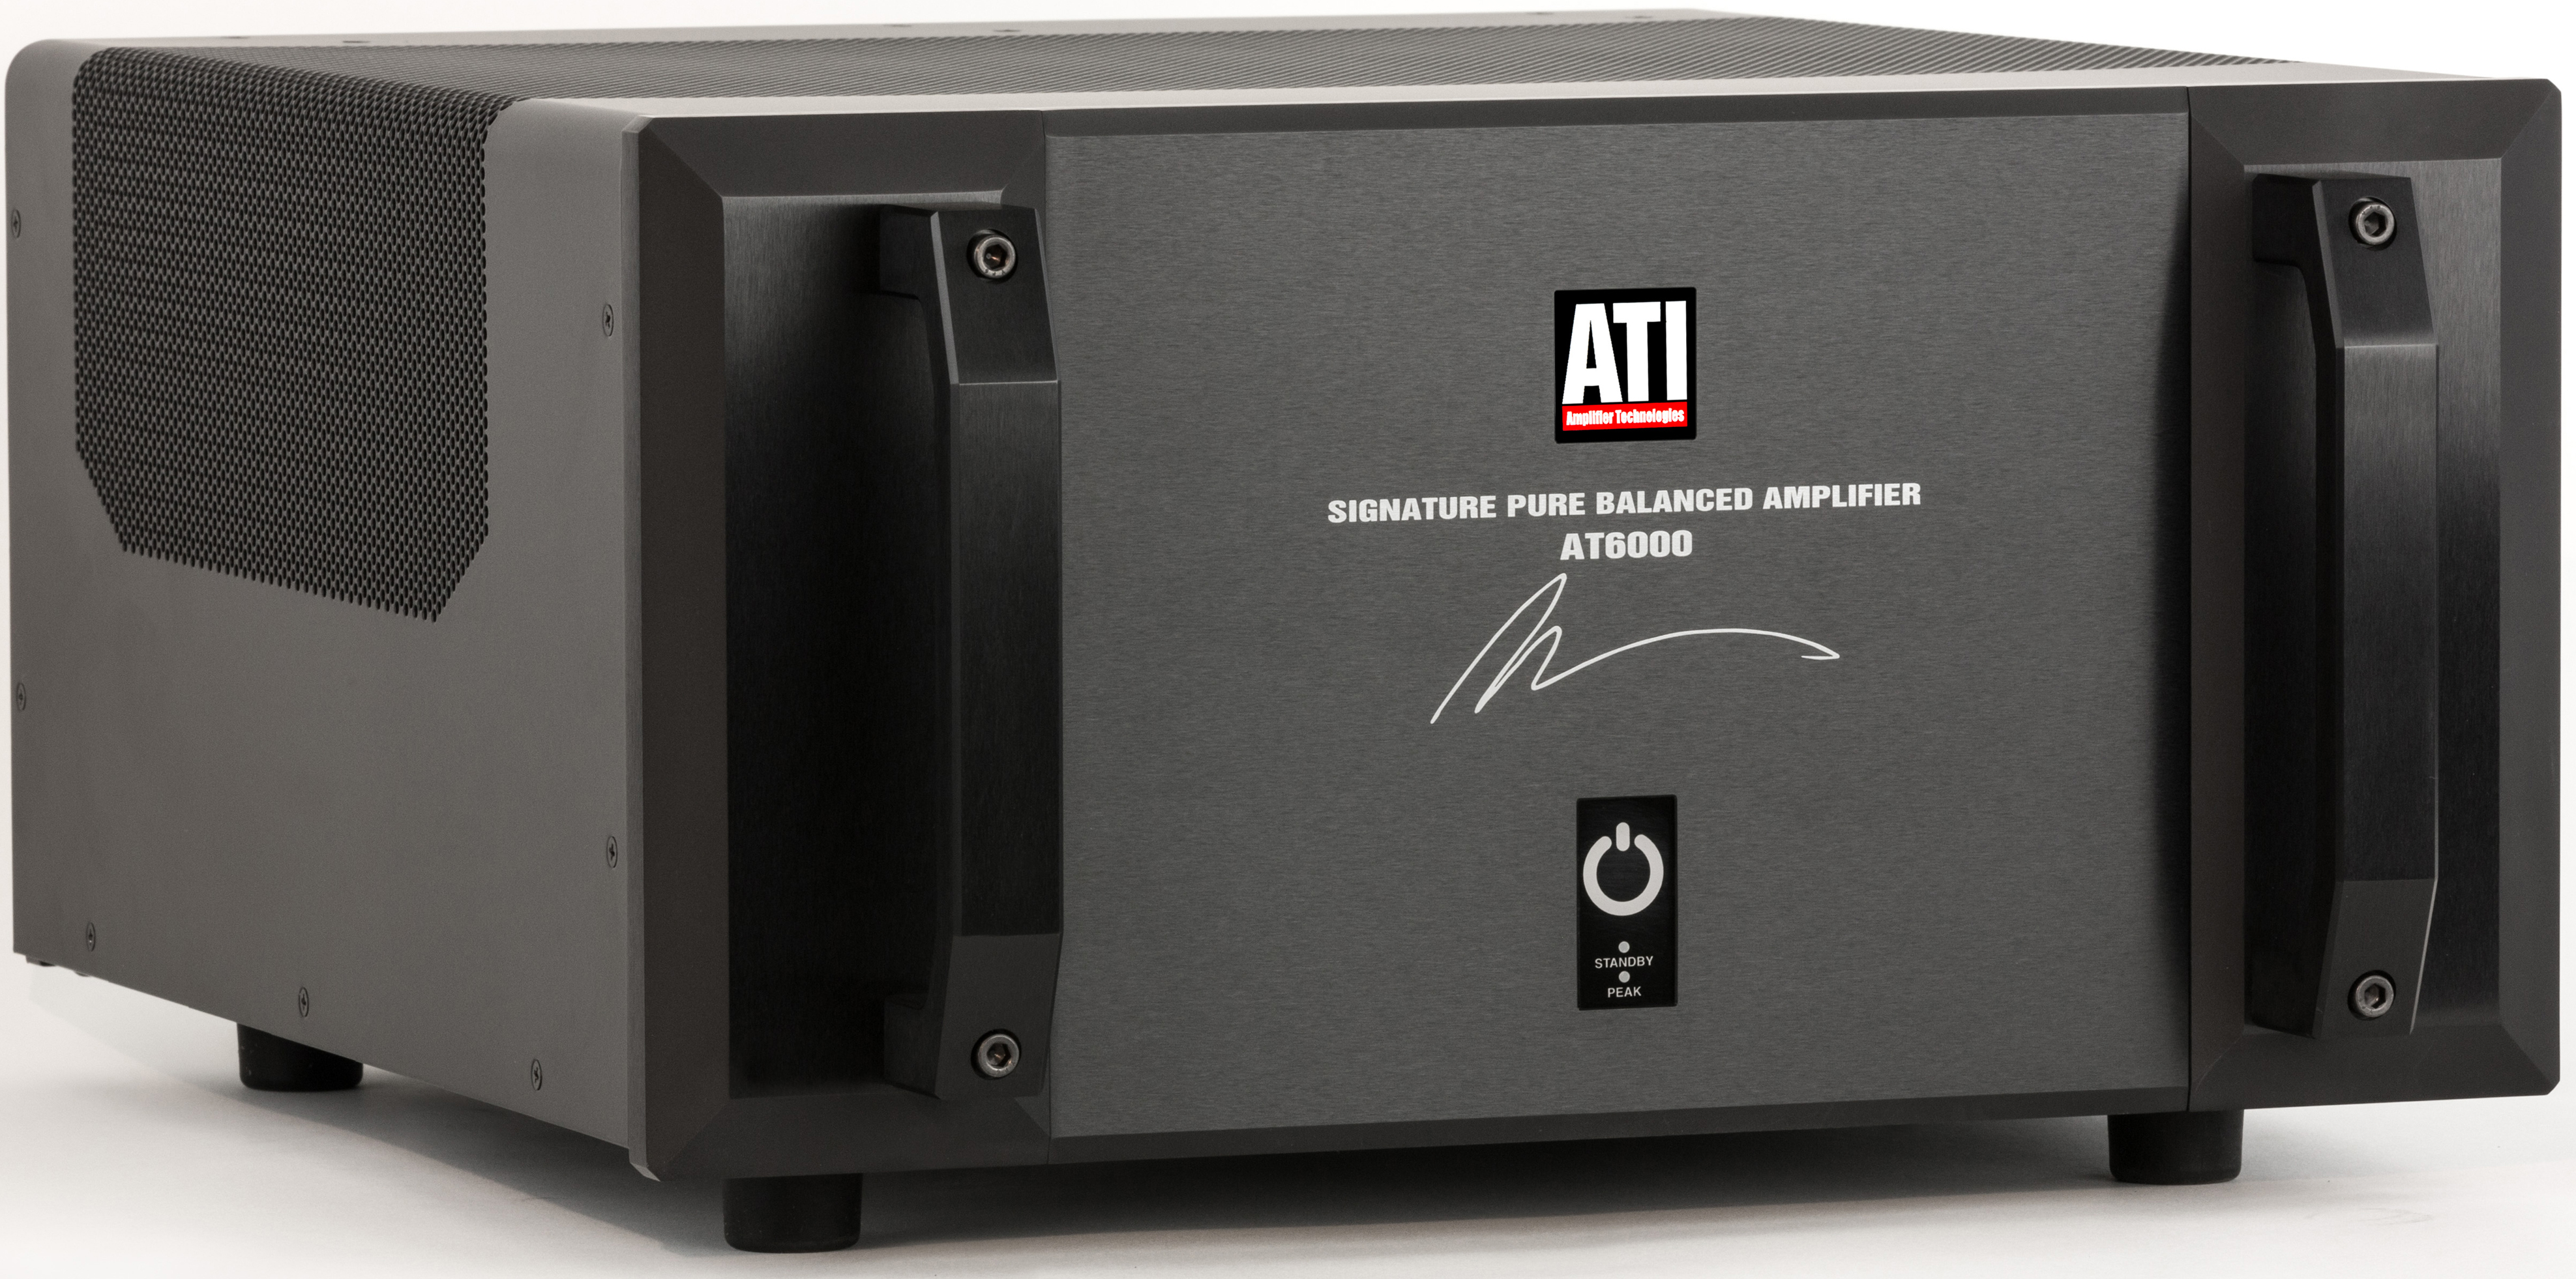 Amplifier Sound Elite Home Theatre